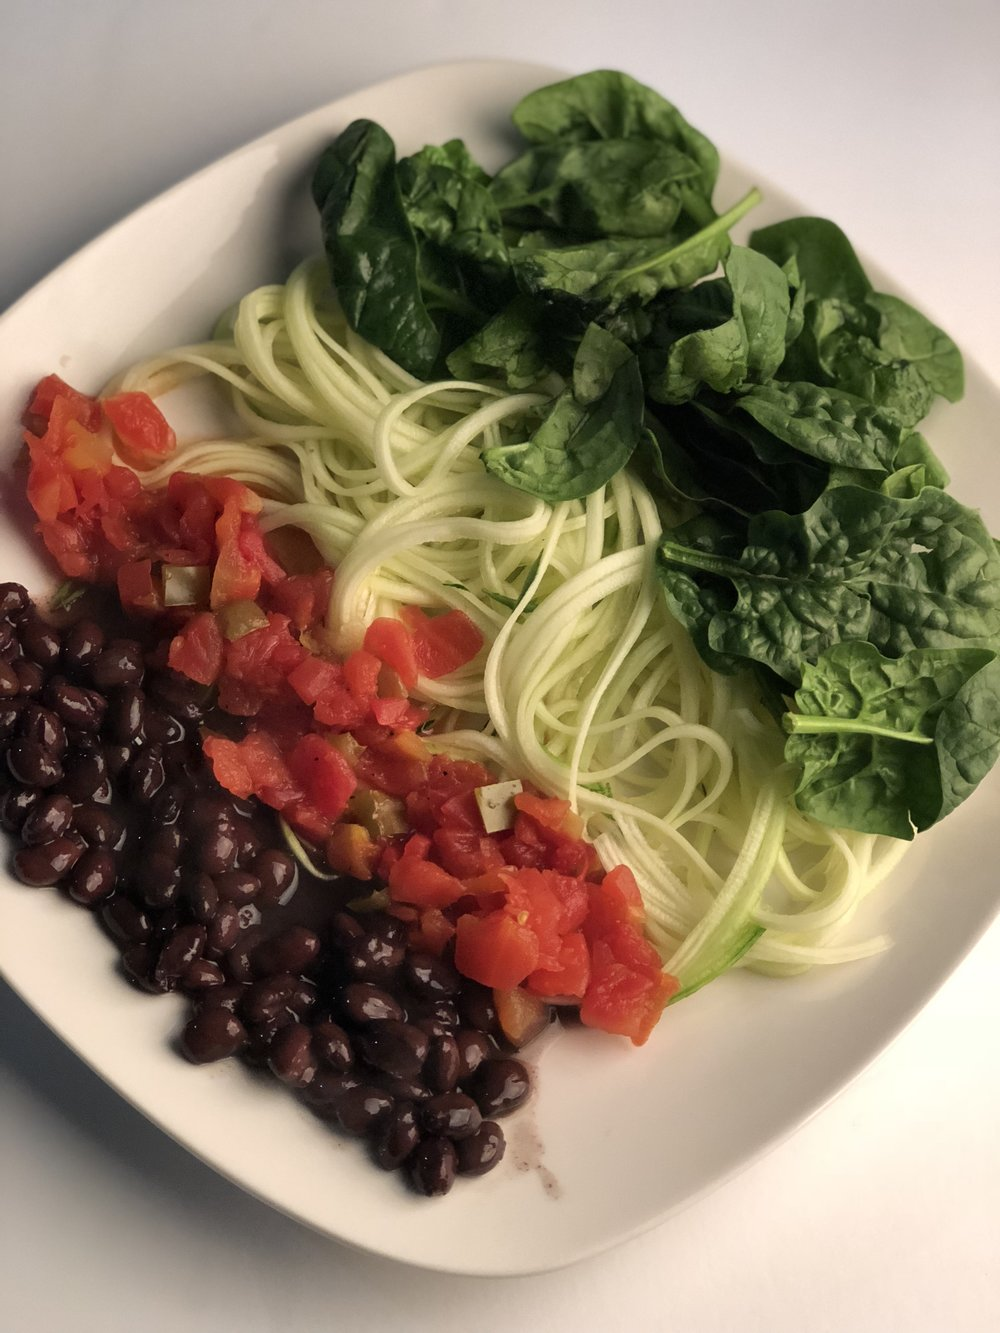 Vegan Platter   Spinach, Zuchinni Noodles, black beans, Spicy habanera sauce, (rice is optional)